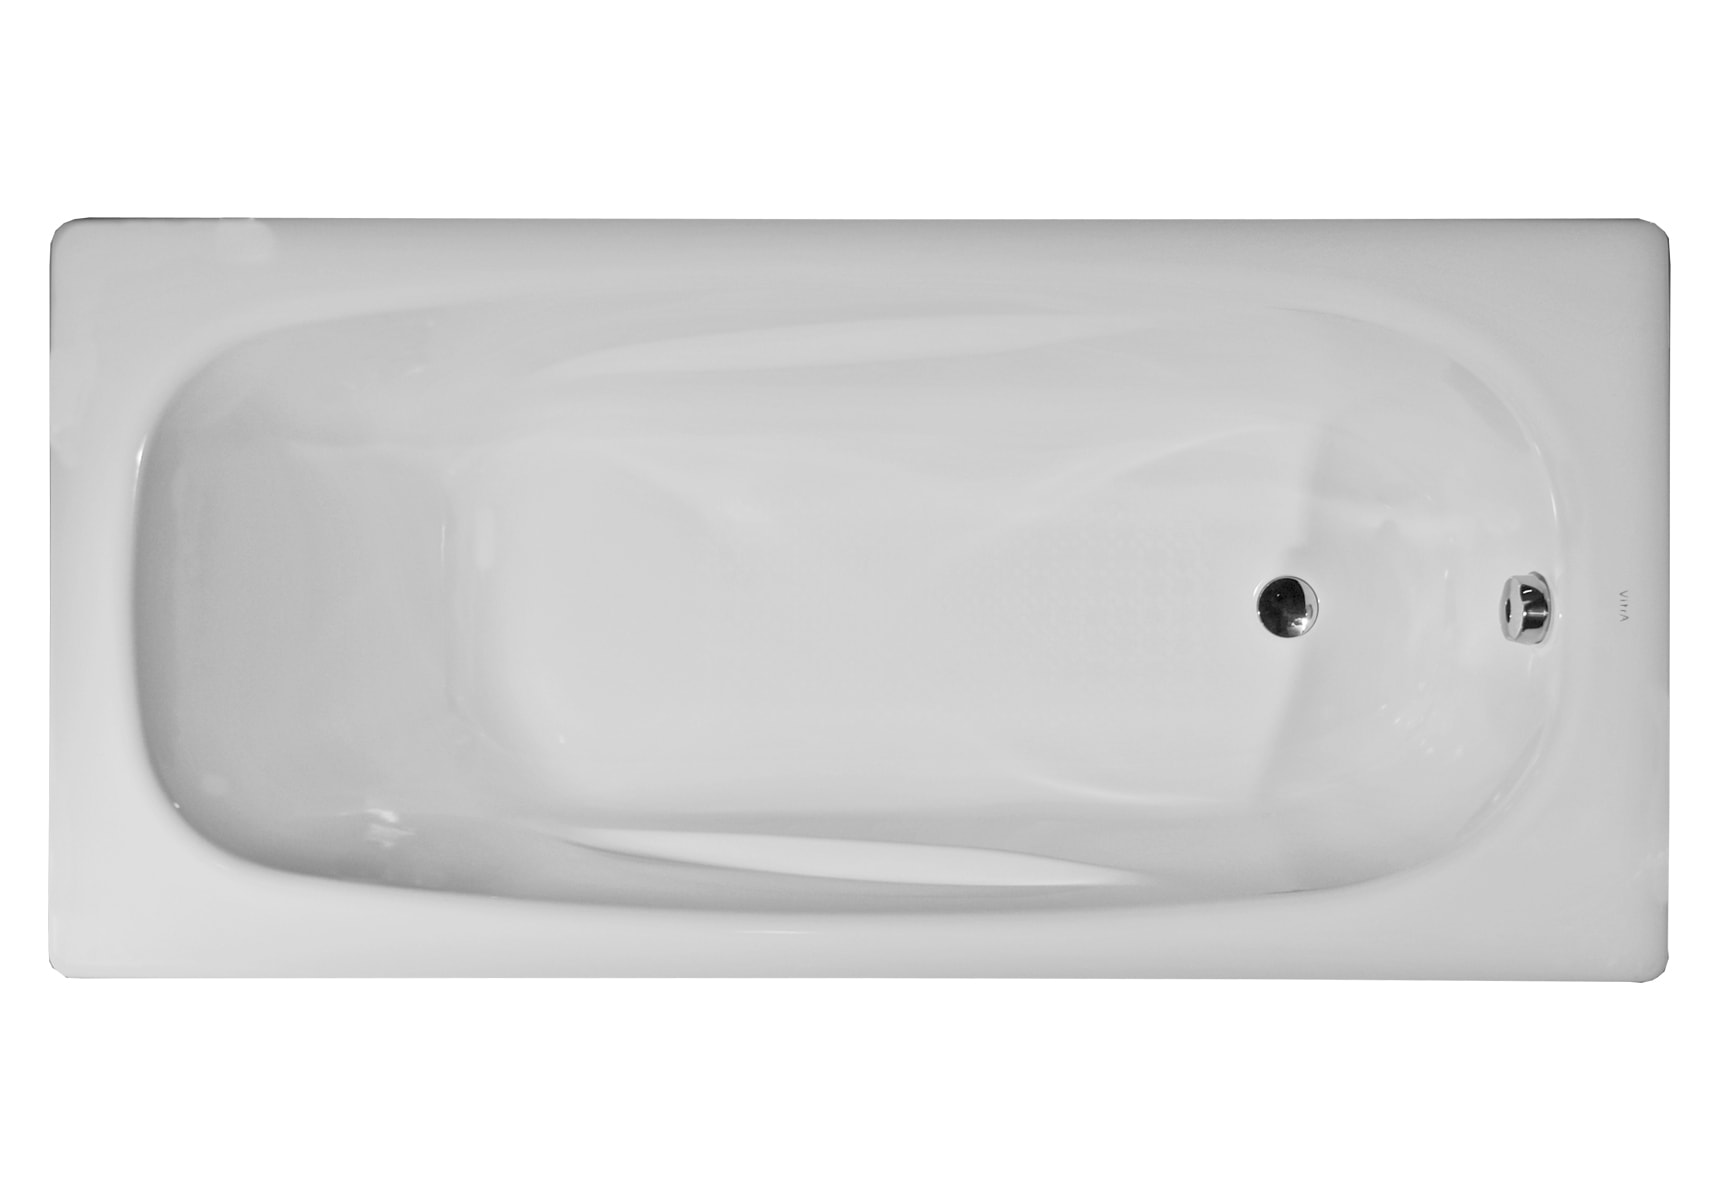 Generic Ergo 170x75cm Steel Bathtub, 3.5mm, Sound Proofing Pad